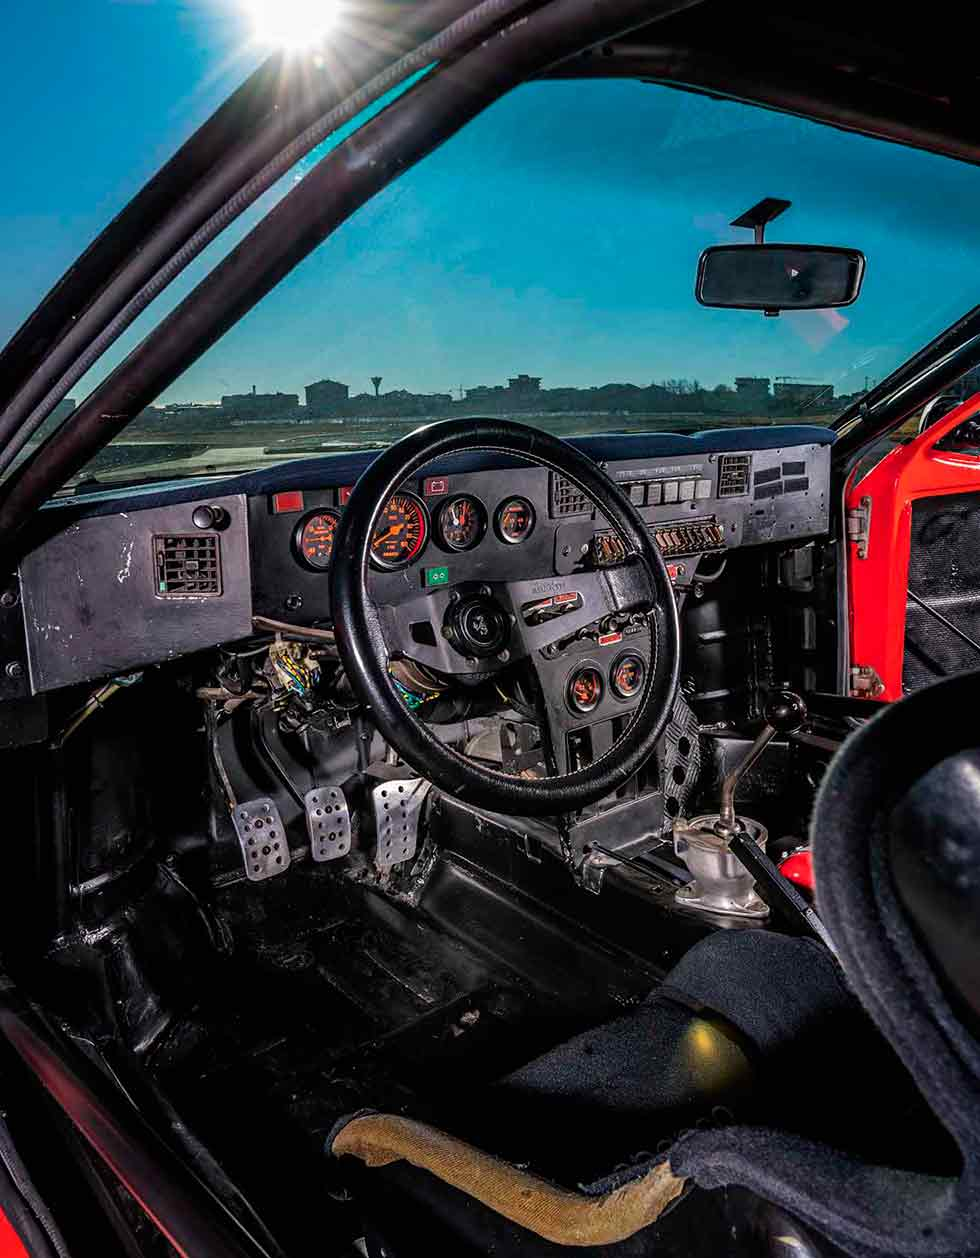 1980 Lancia Abarth Rally SE 037 Prototype - road test